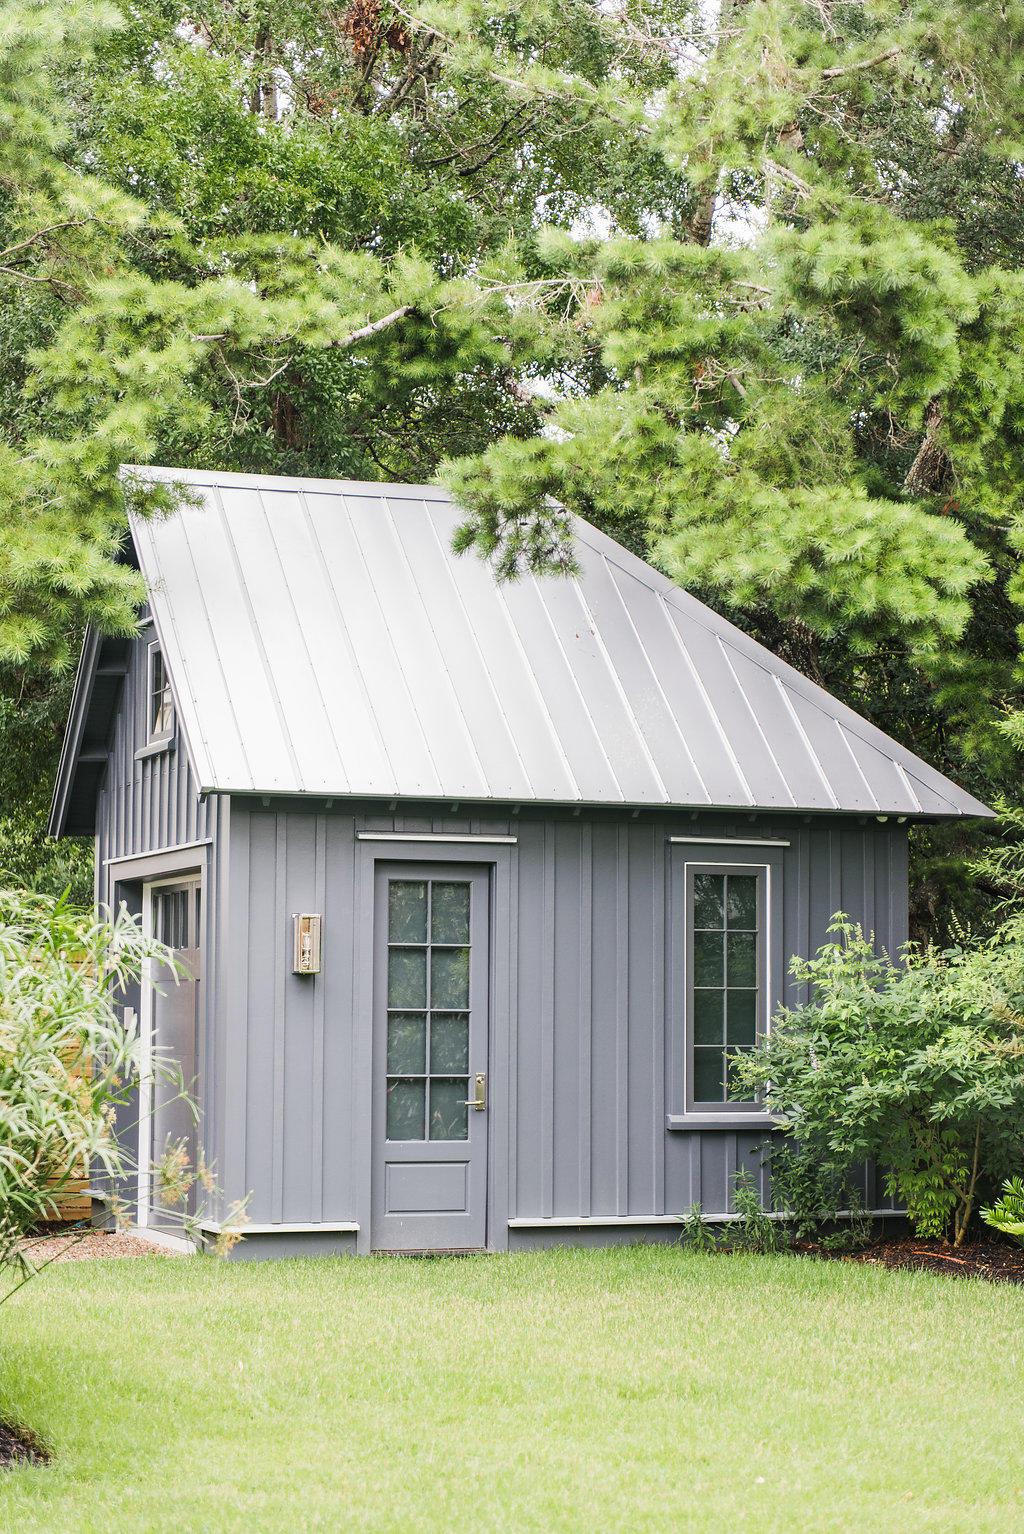 Old Mt Pleasant Homes For Sale - 745 Winthrop, Mount Pleasant, SC - 10